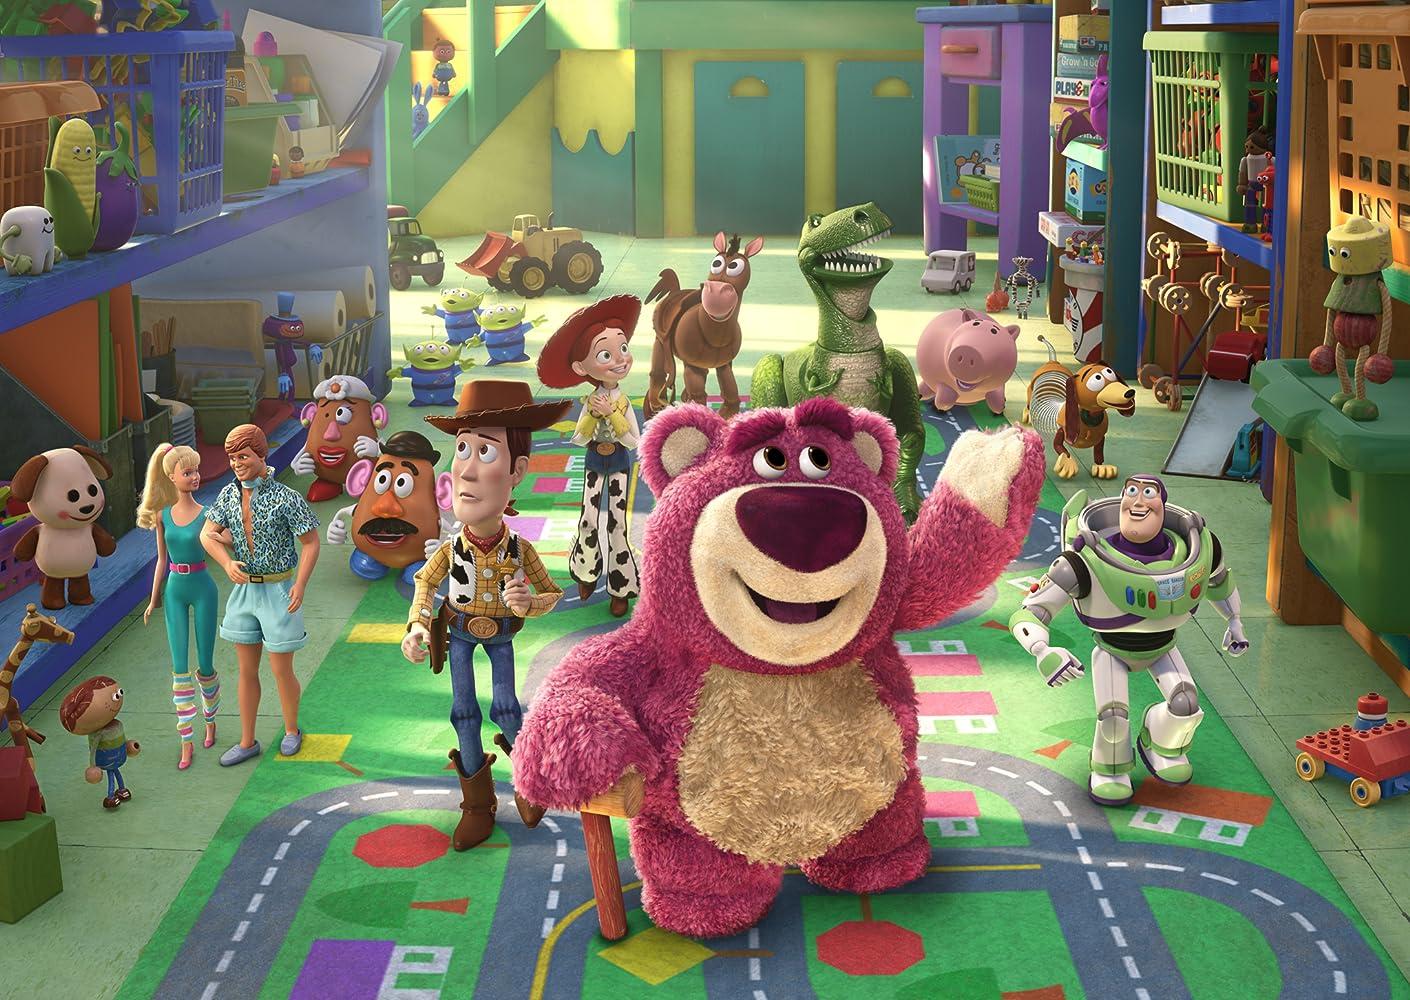 Tom Hanks, Joan Cusack, Michael Keaton, Tim Allen, Ned Beatty, John Ratzenberger, Wallace Shawn, Jodi Benson, Blake Clark, Estelle Harris, Jeff Pidgeon, and Don Rickles in Toy Story 3 (2010)